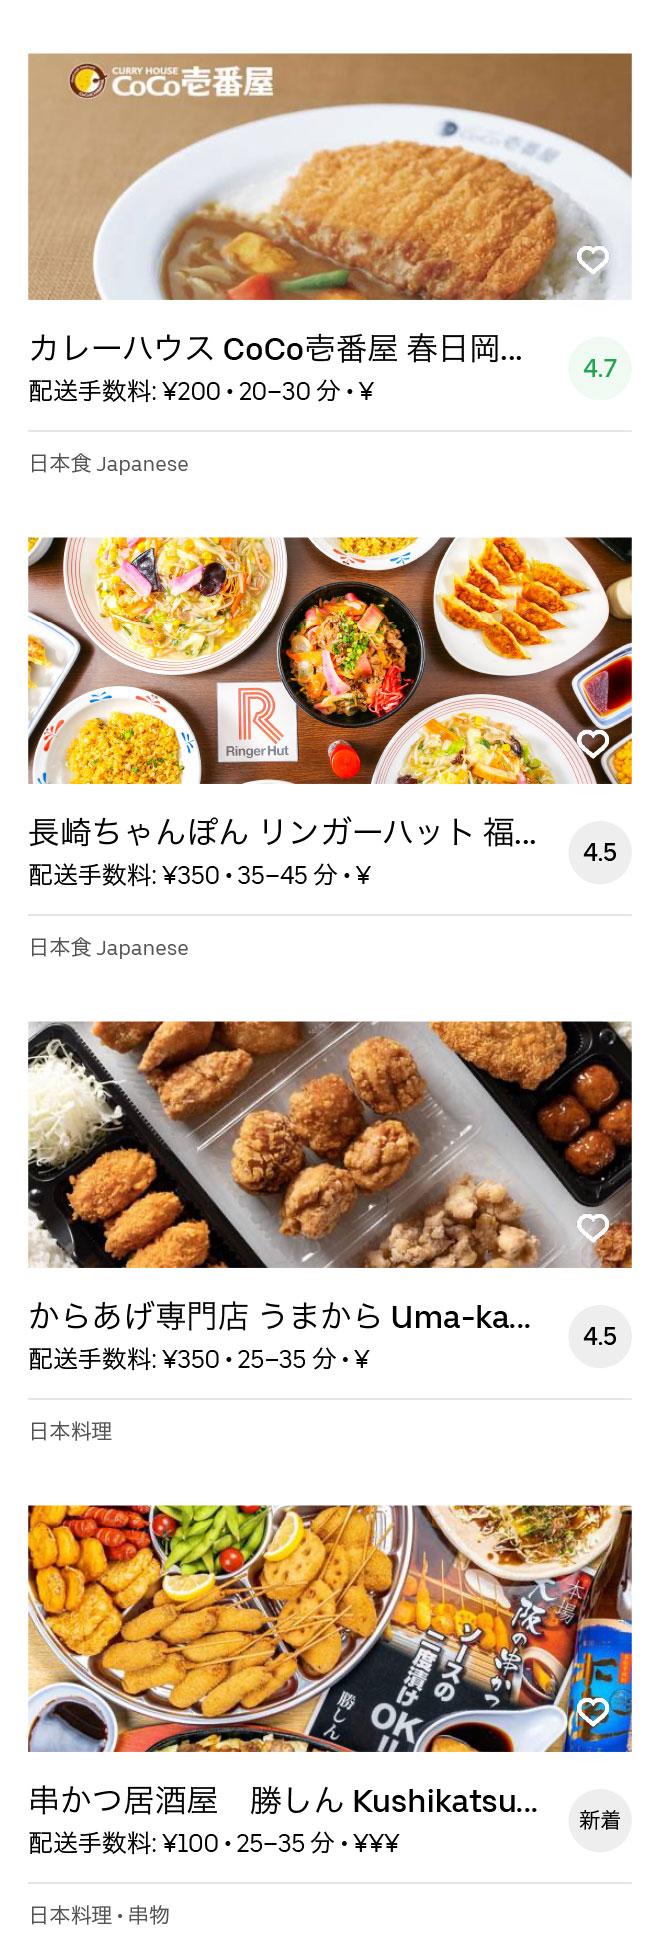 Kasuga hakataminami menu 2004 03